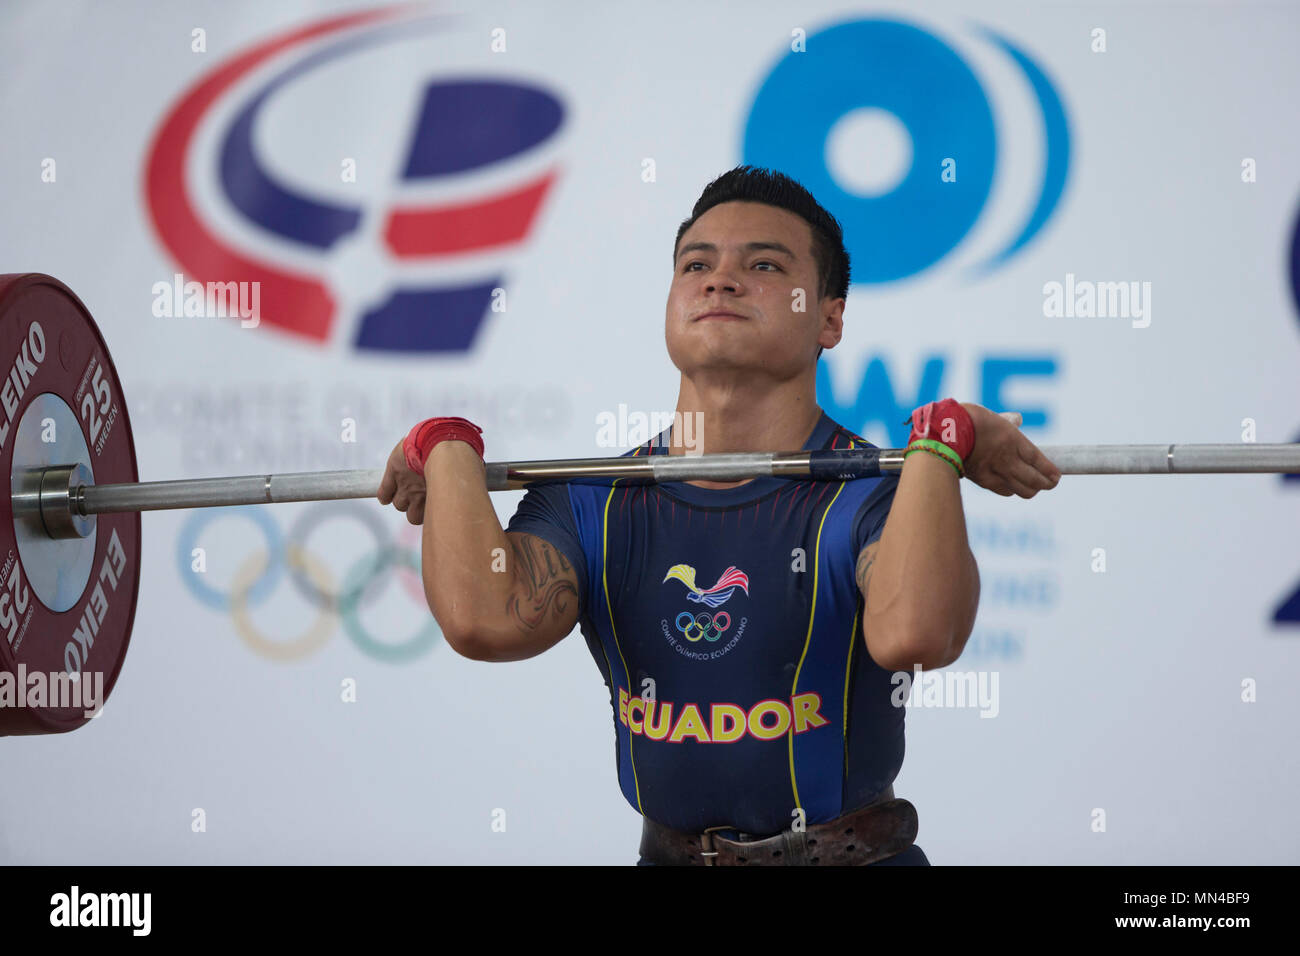 Ecuadoran Walter Zurita participates in the Senior Pan American Weightlifting Championship 2018 men's 56kgs category in Santo Domingo, Dominican Republic, 14 May 2018. EFE/Orando Barria - Stock Image